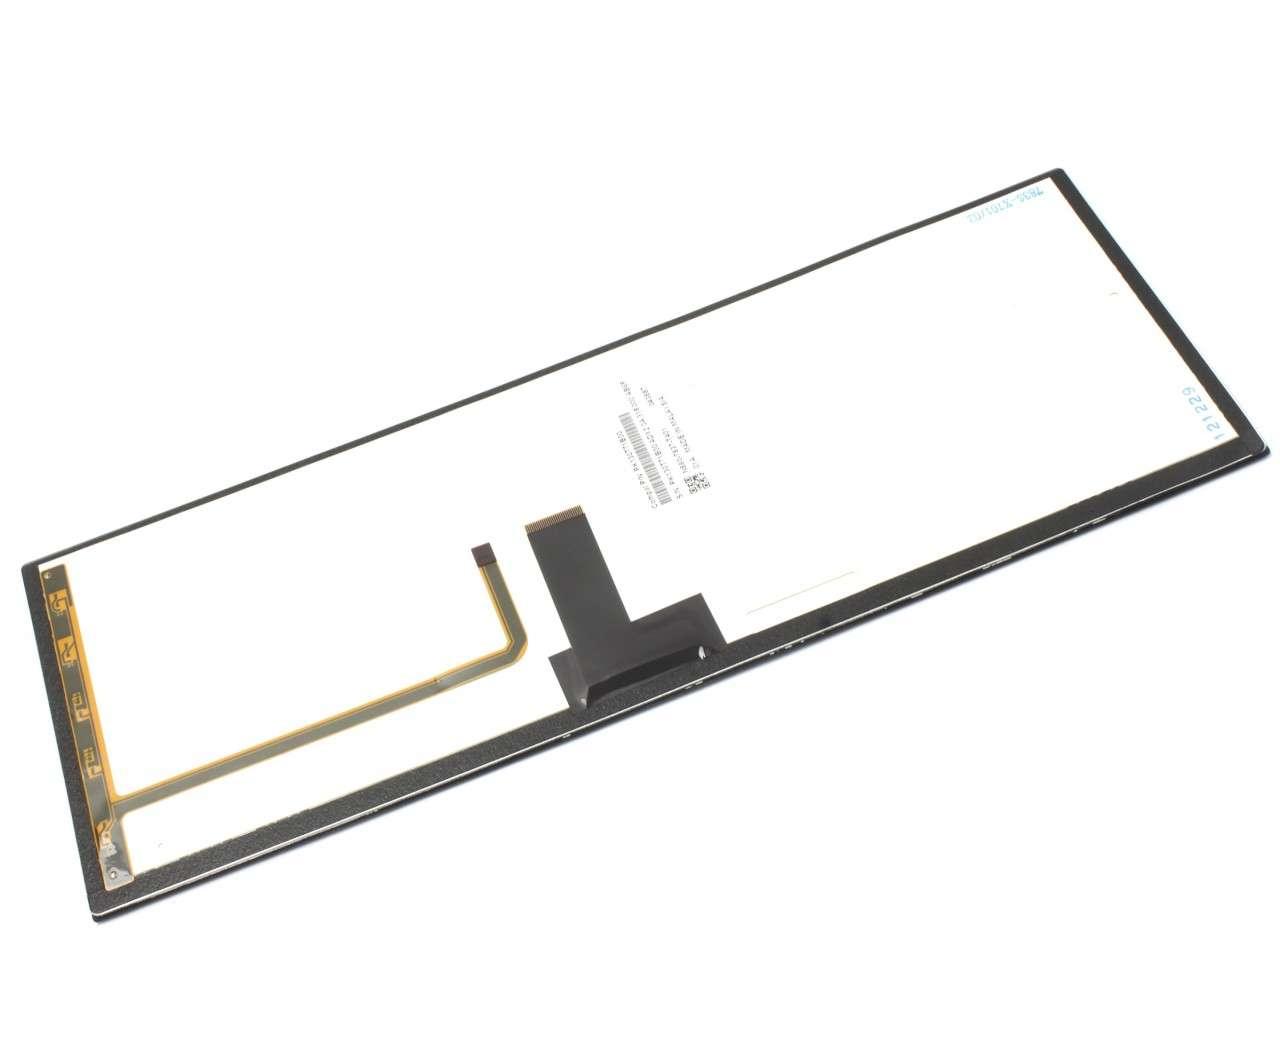 Tastatura Toshiba AEBU6F00010 FR Rama albastra iluminata backlit imagine powerlaptop.ro 2021